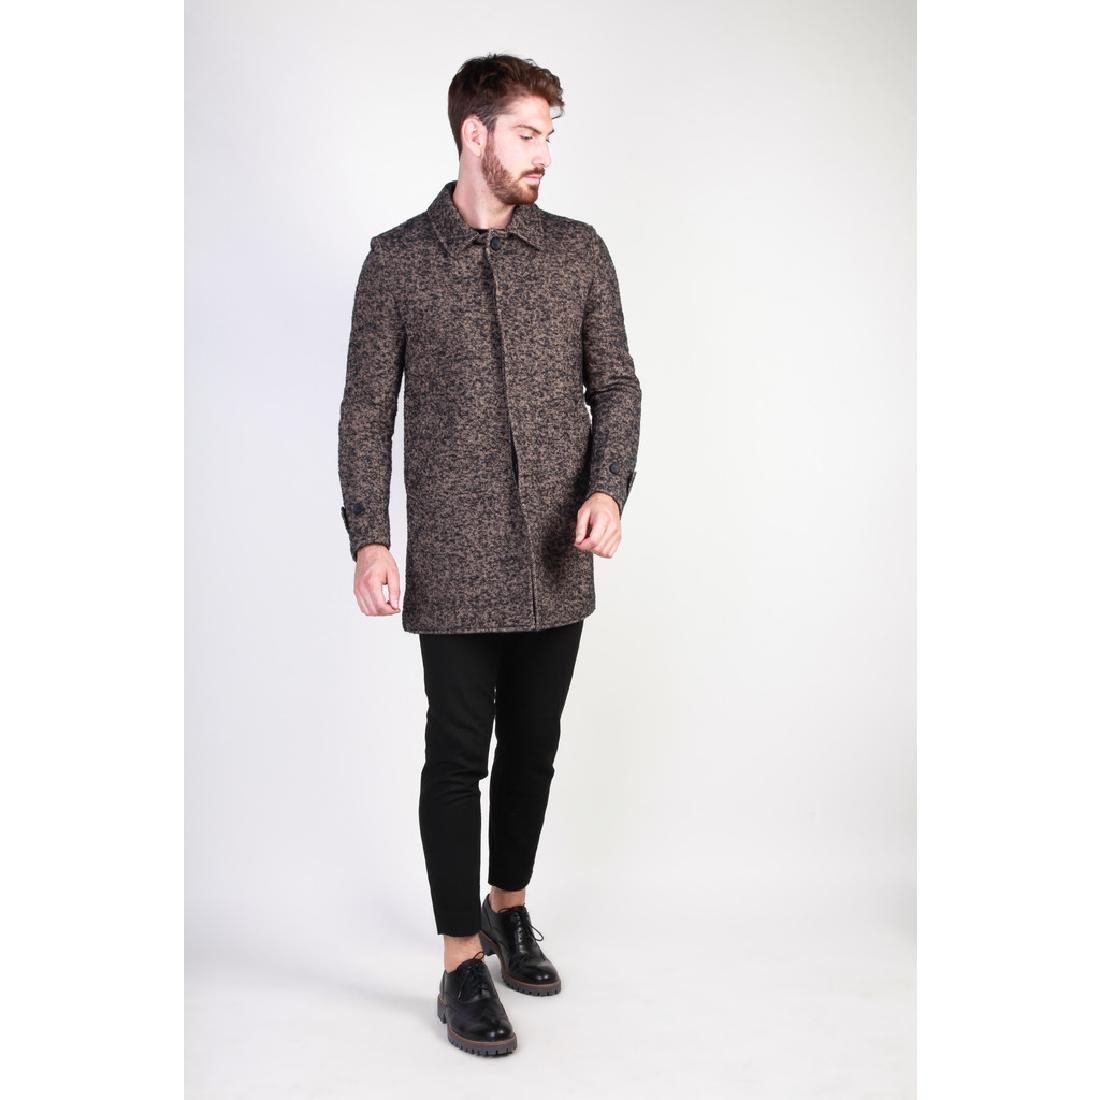 New Men's Italian Wool Blend Coat US 38 - 5